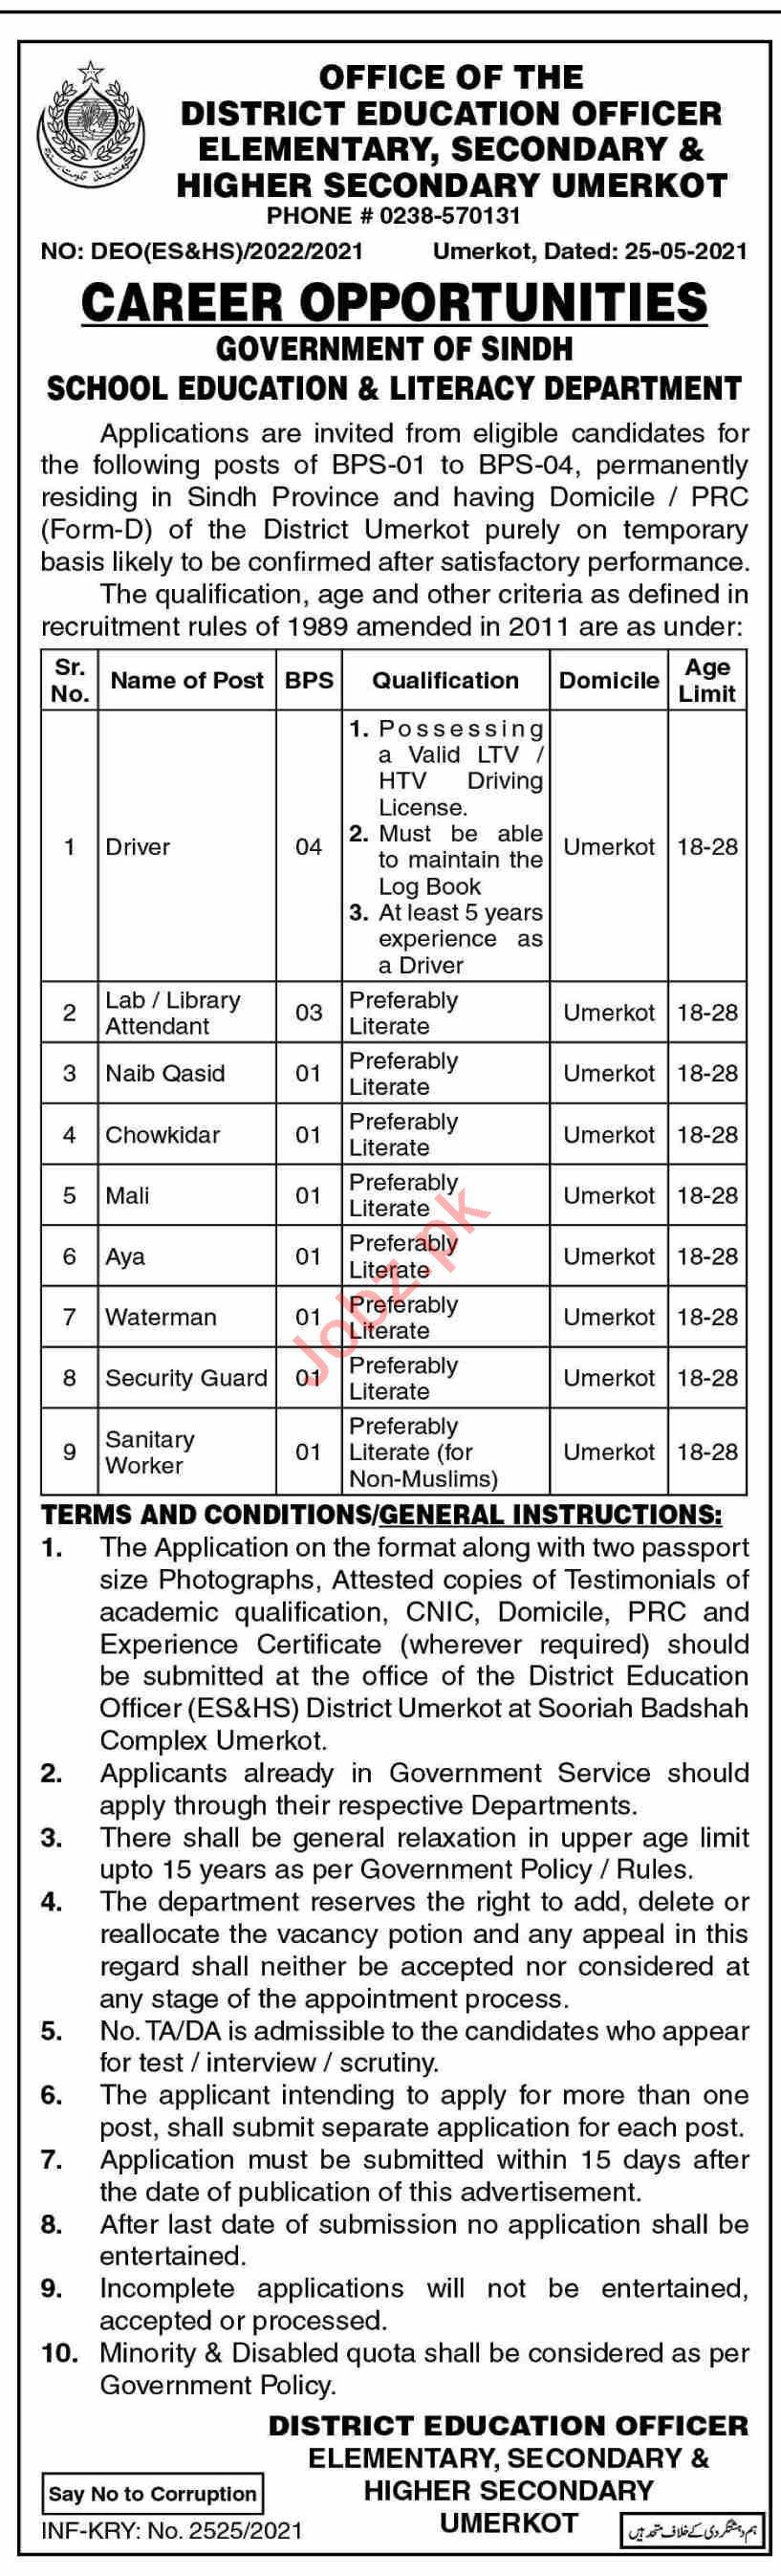 Elementary Secondary & Higher Secondary Umerkot Jobs 2021